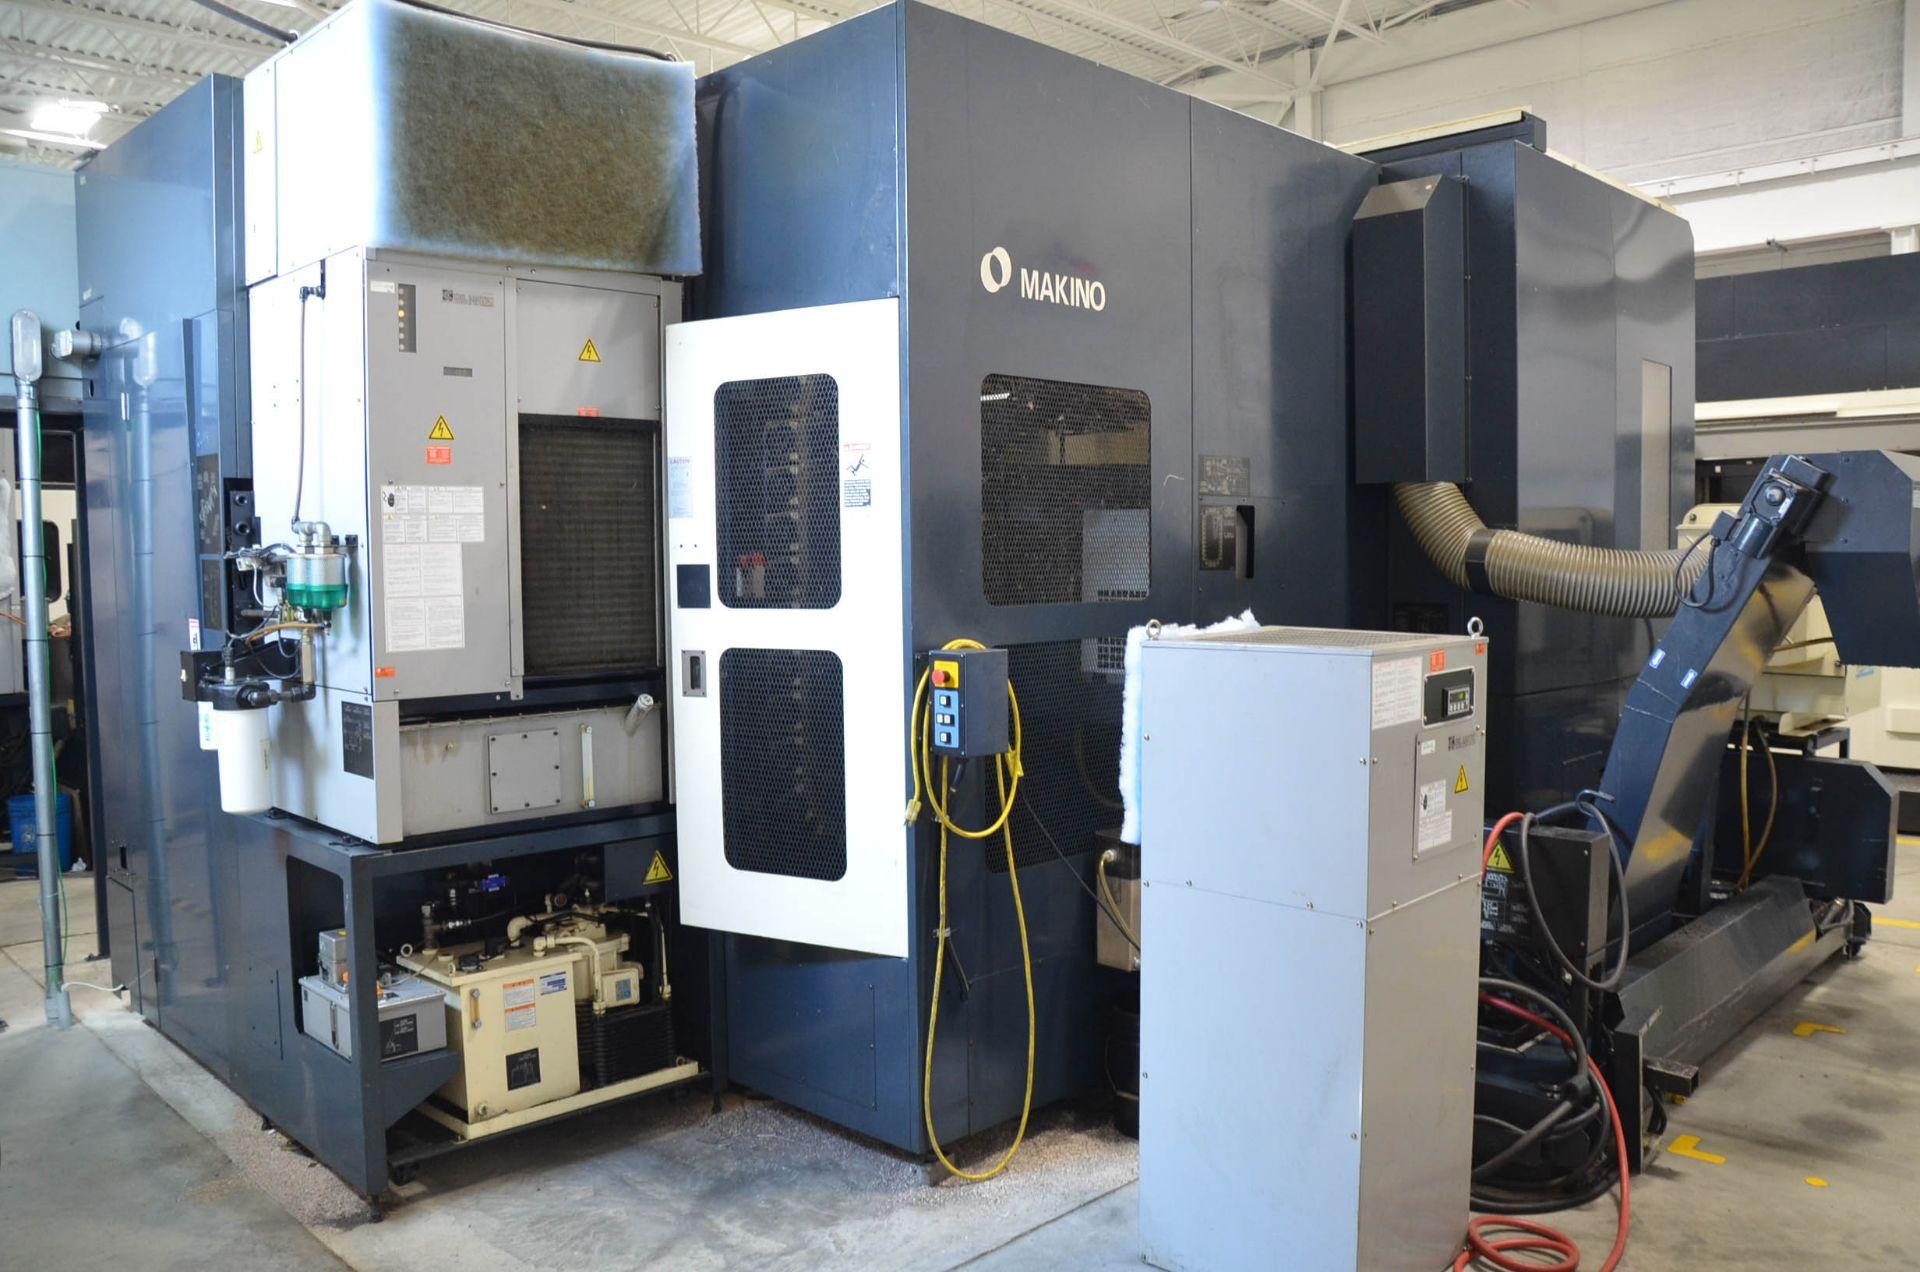 MAKINO (2008) MCC2013 4-AXIS HORIZONTAL MACHINING CENTER WITH MAKINO PROFESSIONAL 5 CNC CONTROL, - Image 7 of 12